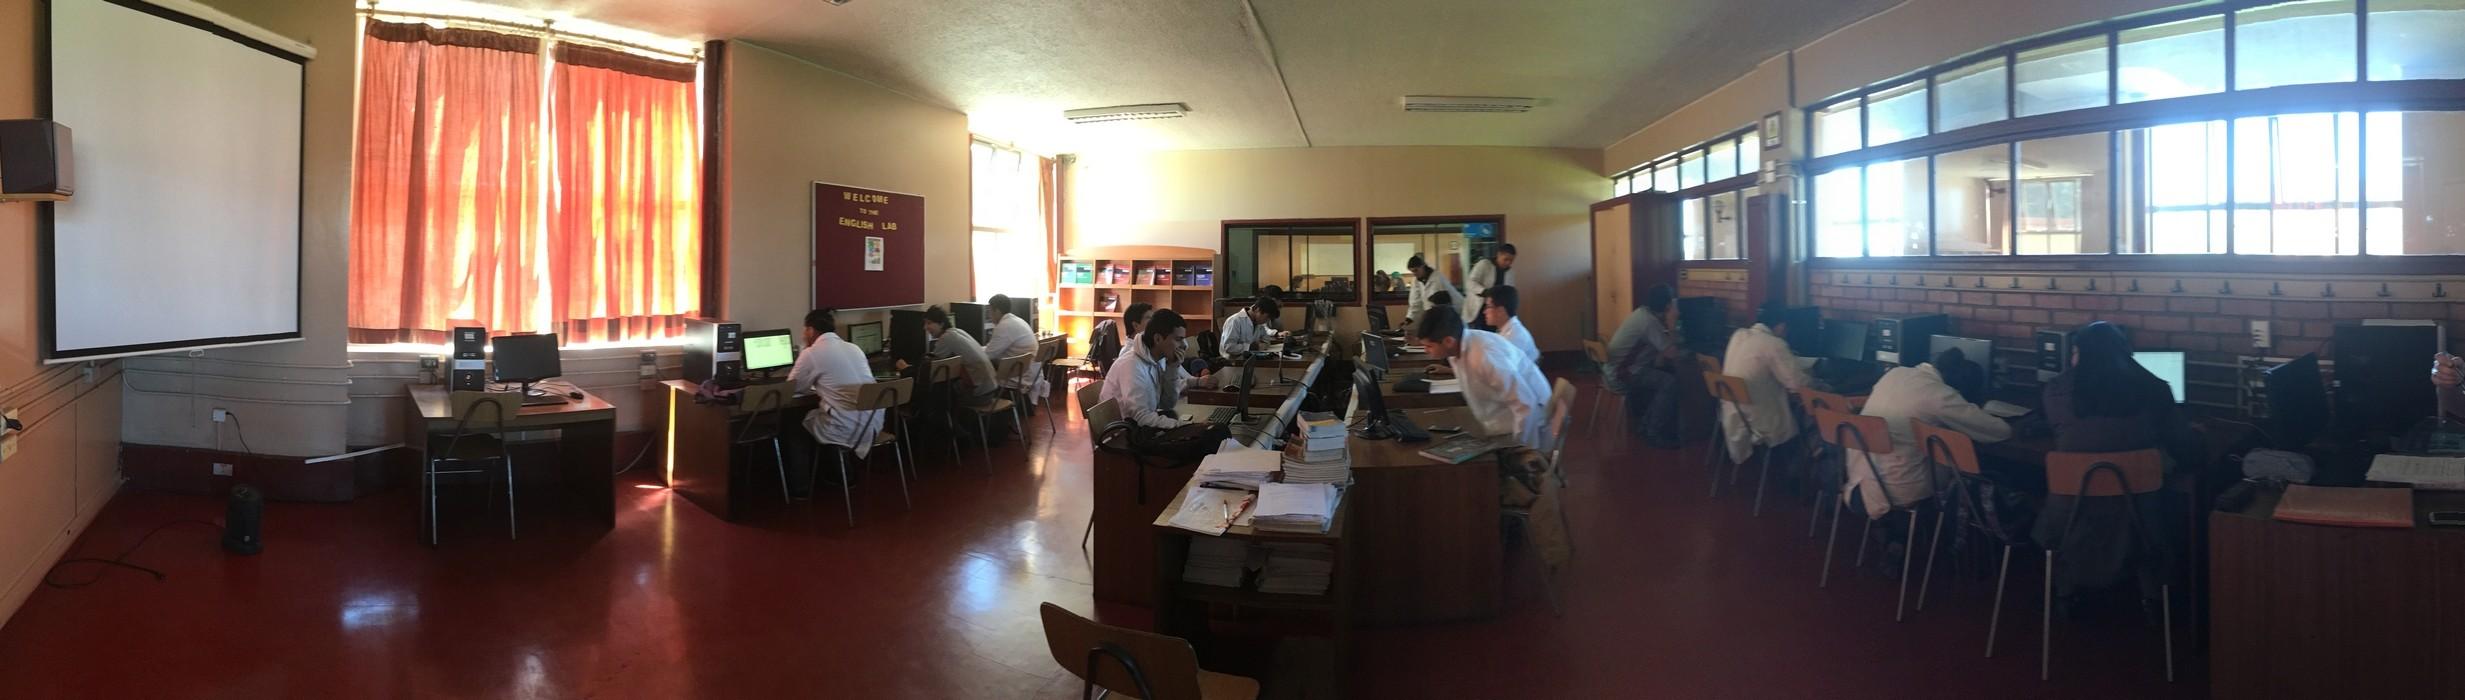 Laboratorio de Inglés